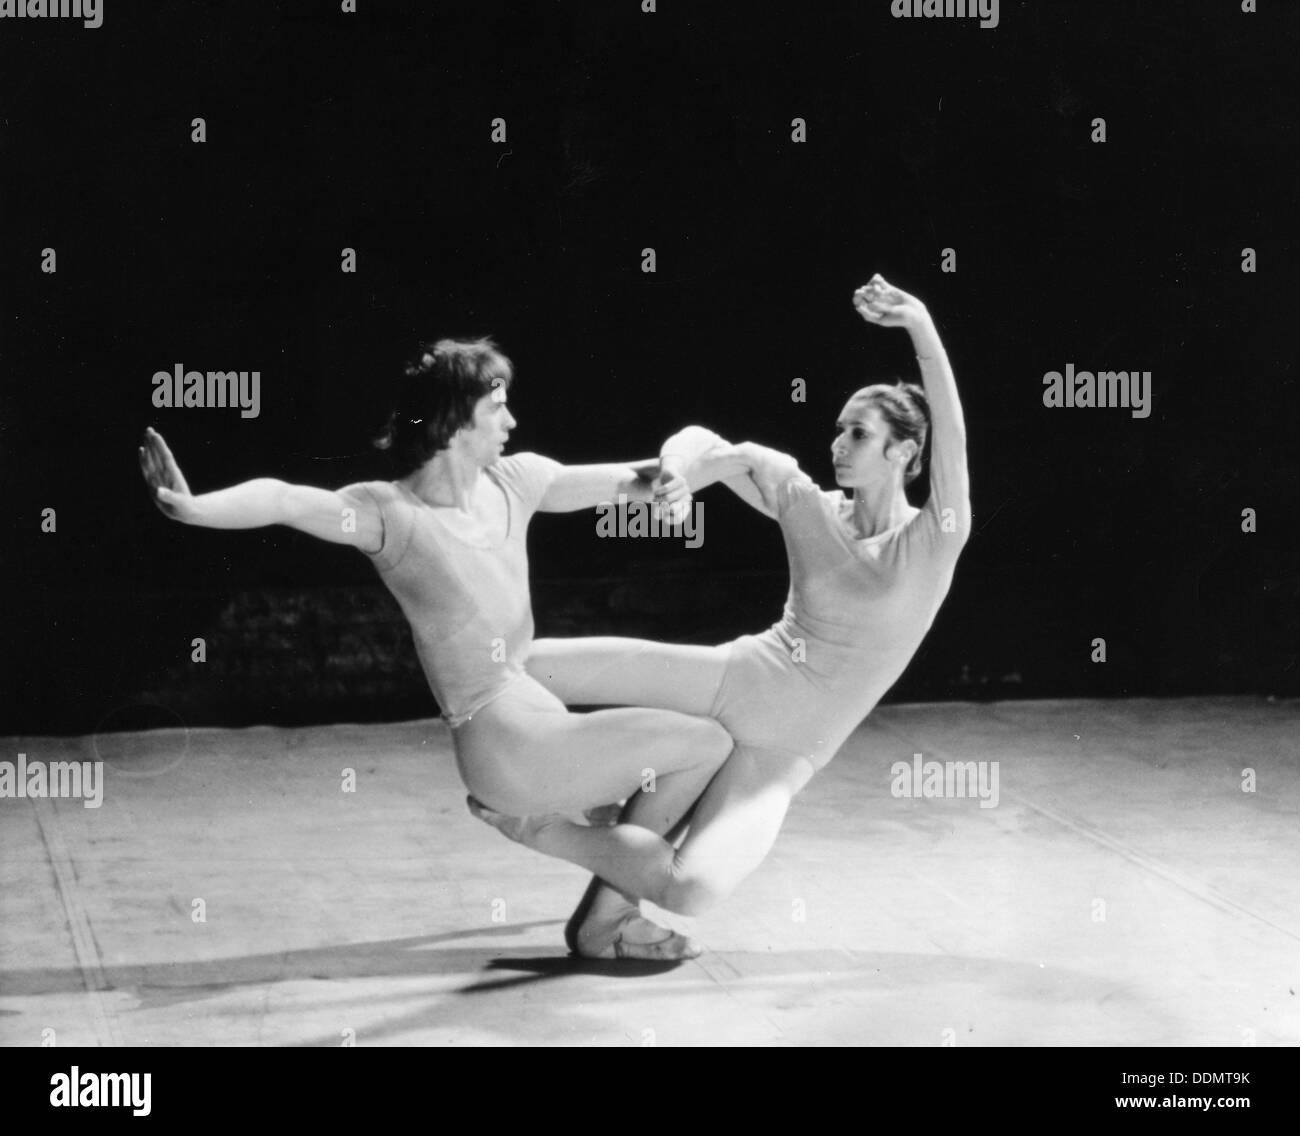 Rudolf Nureyev (1938-1993), Russian ballet dancer. Stock Photo